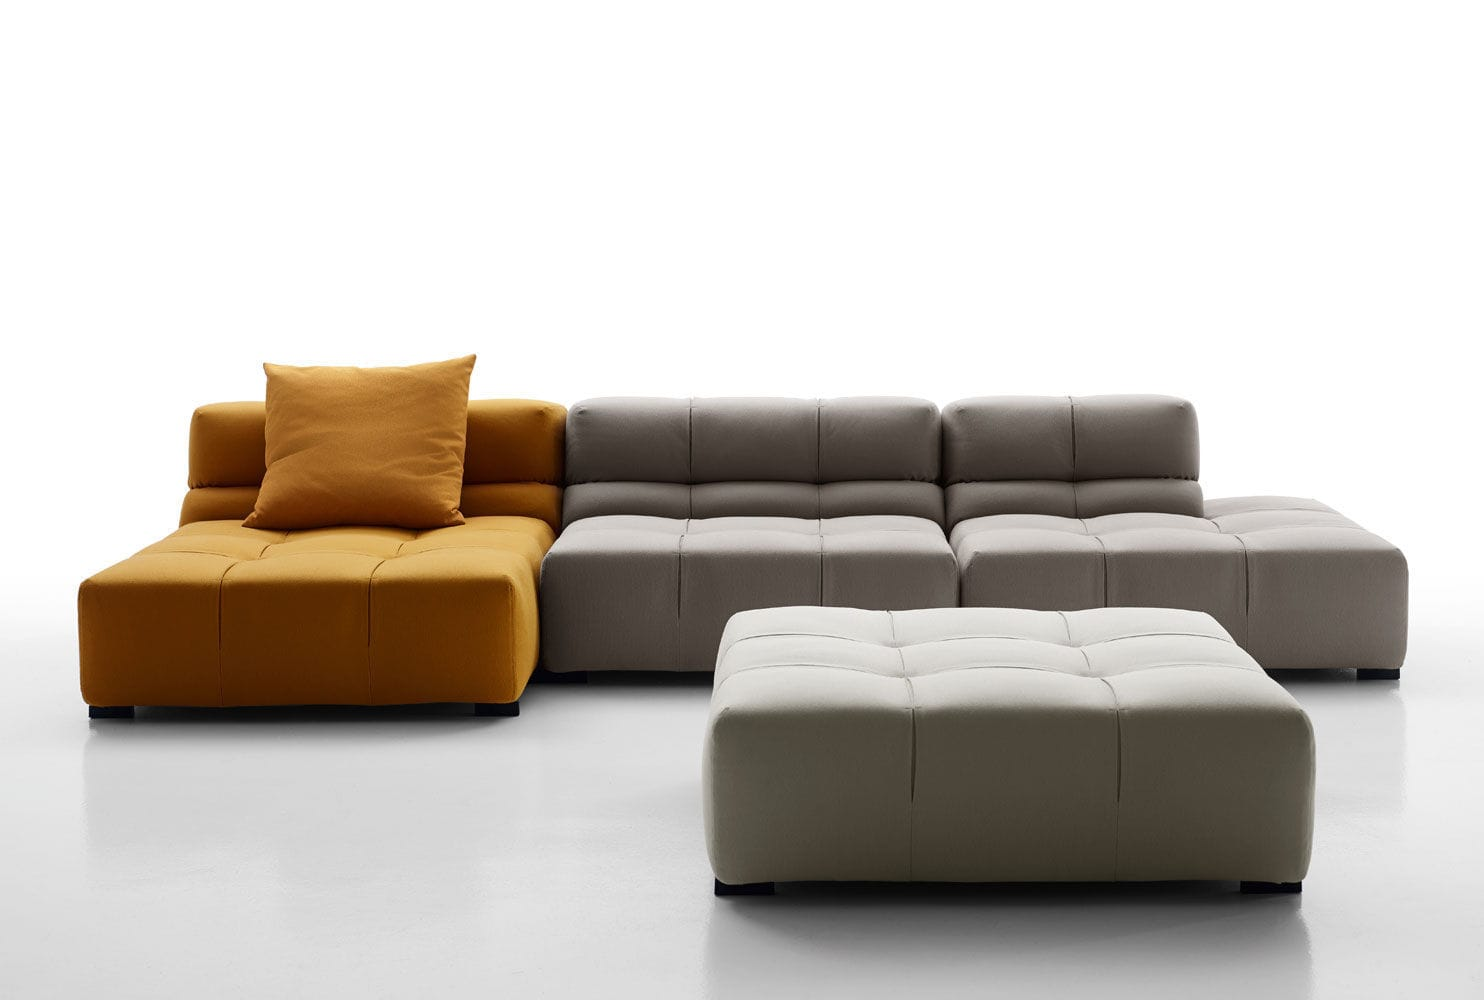 Modular Sofa Contemporary Leather Fabric Tufty Time 15